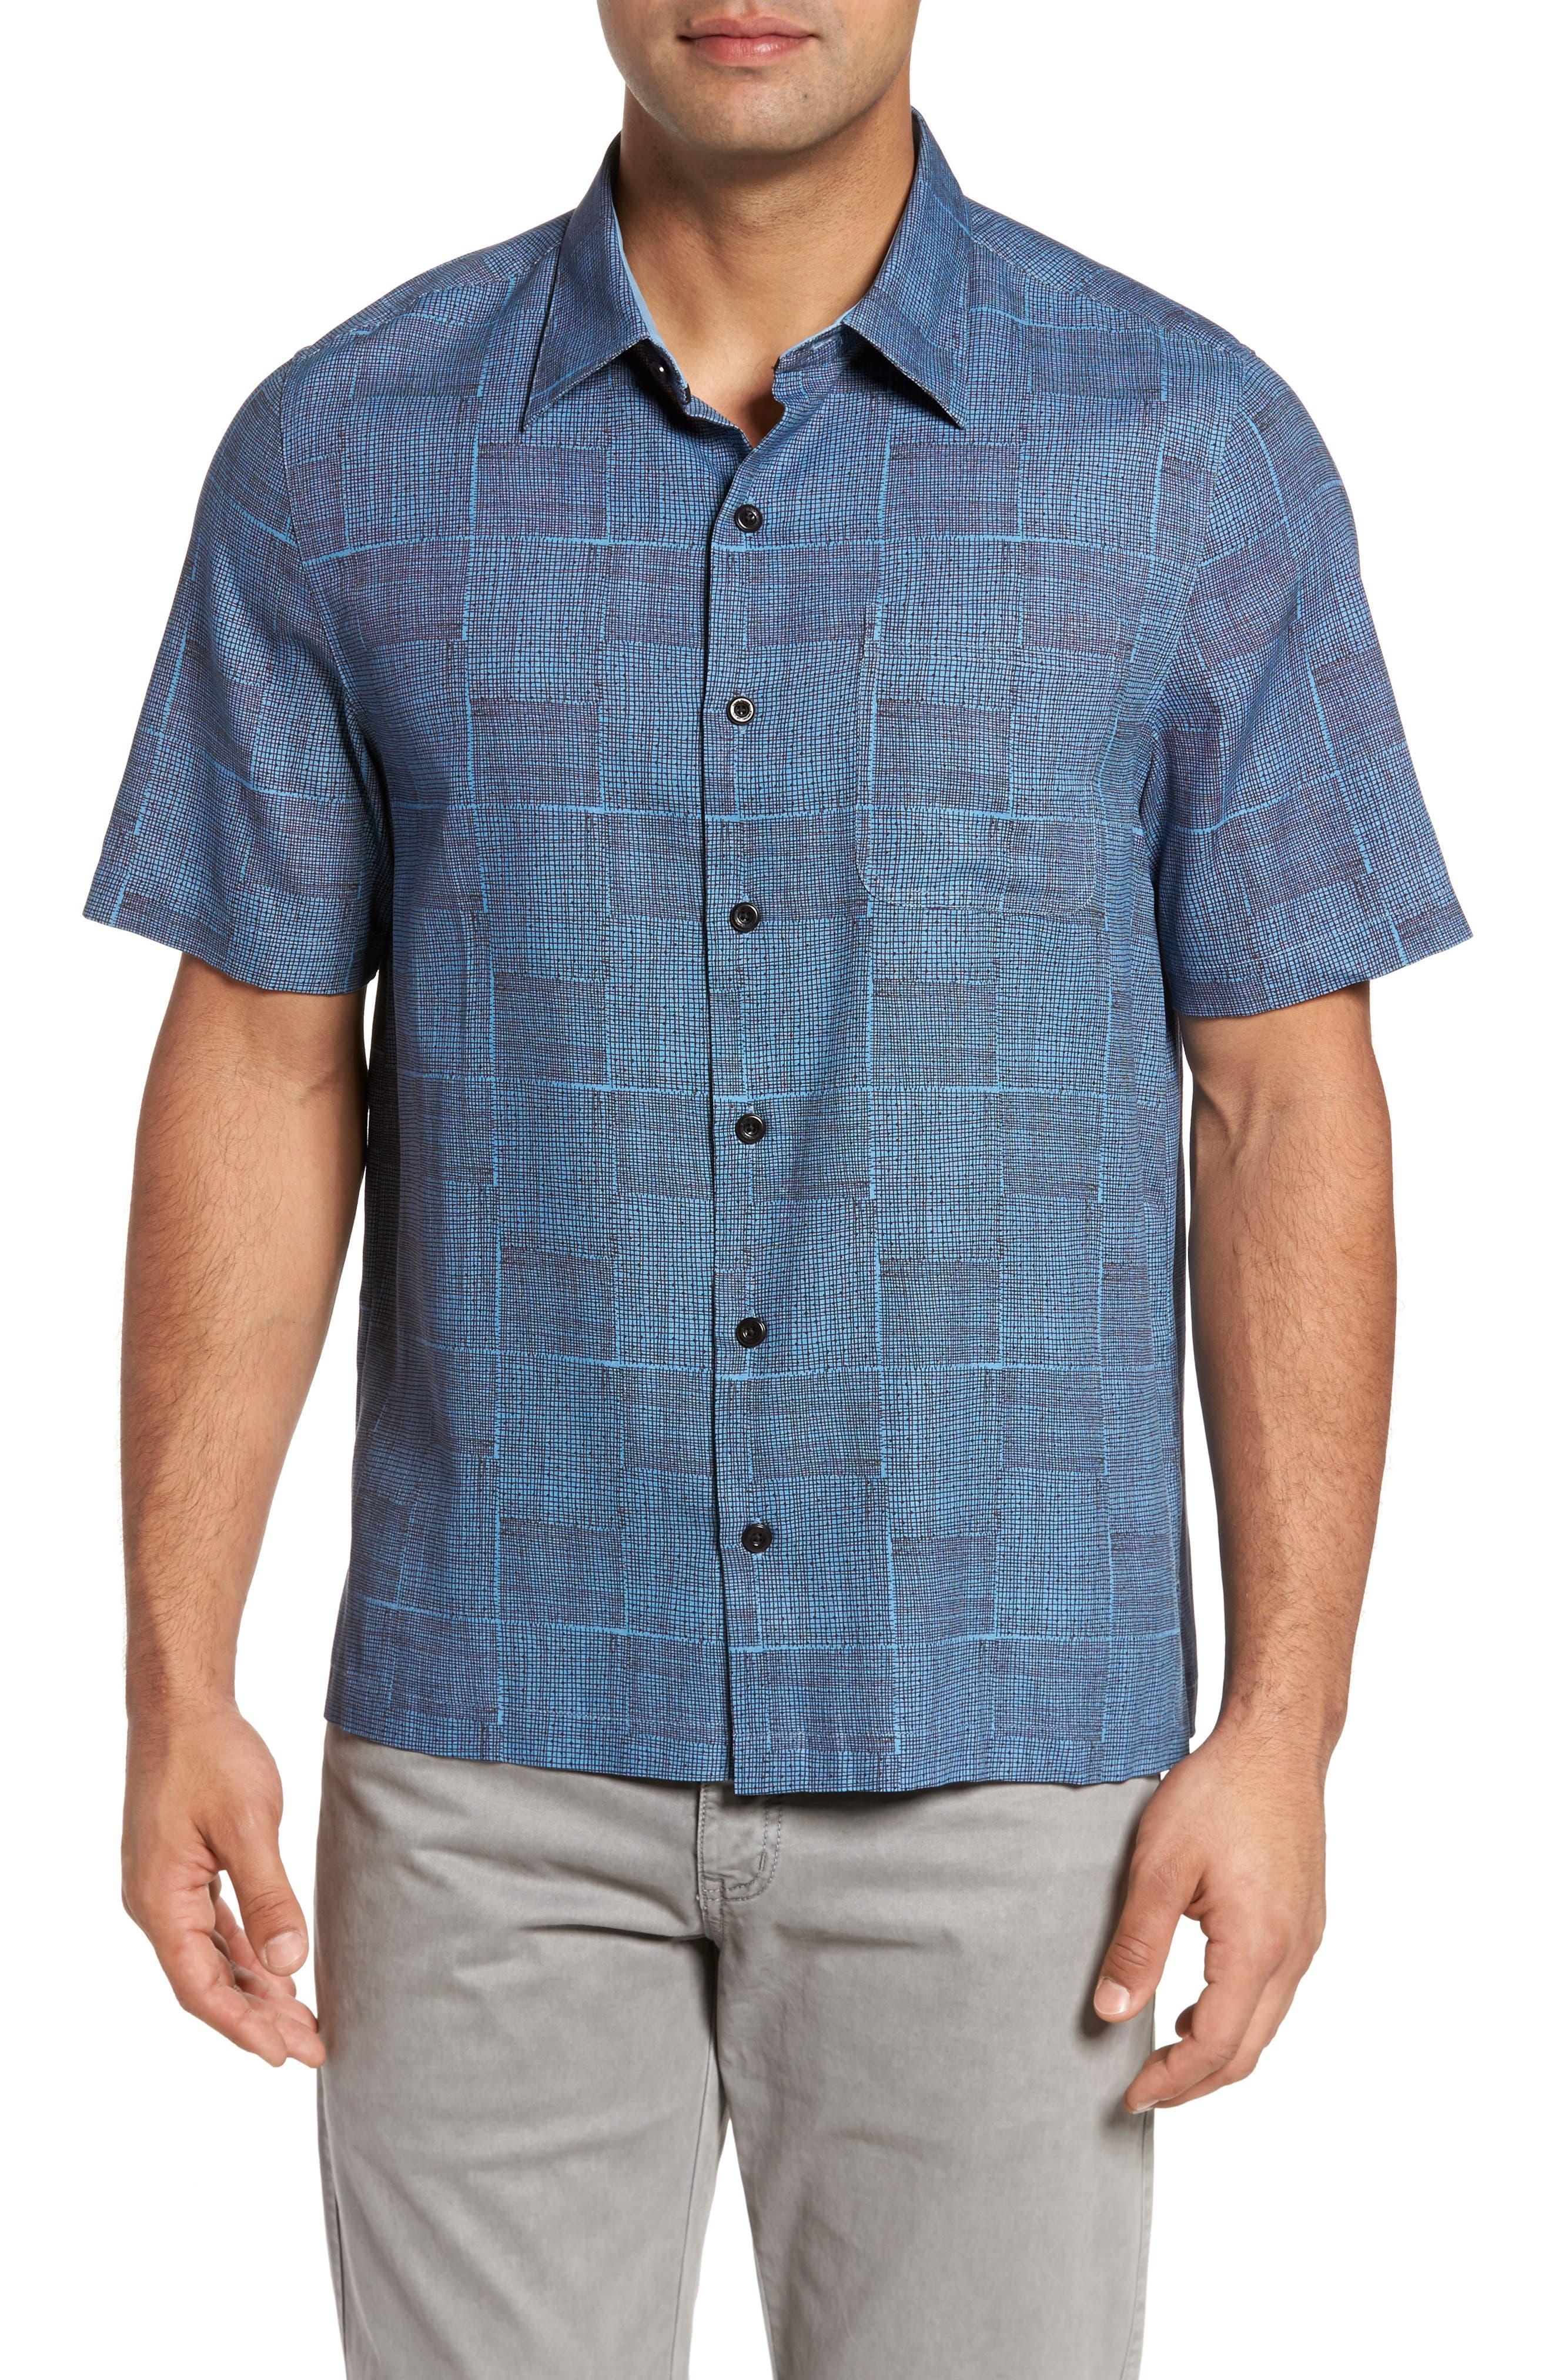 Alternate Image 1 Selected - Nat Nast Alta Classic Fit Silk Blend Camp Shirt